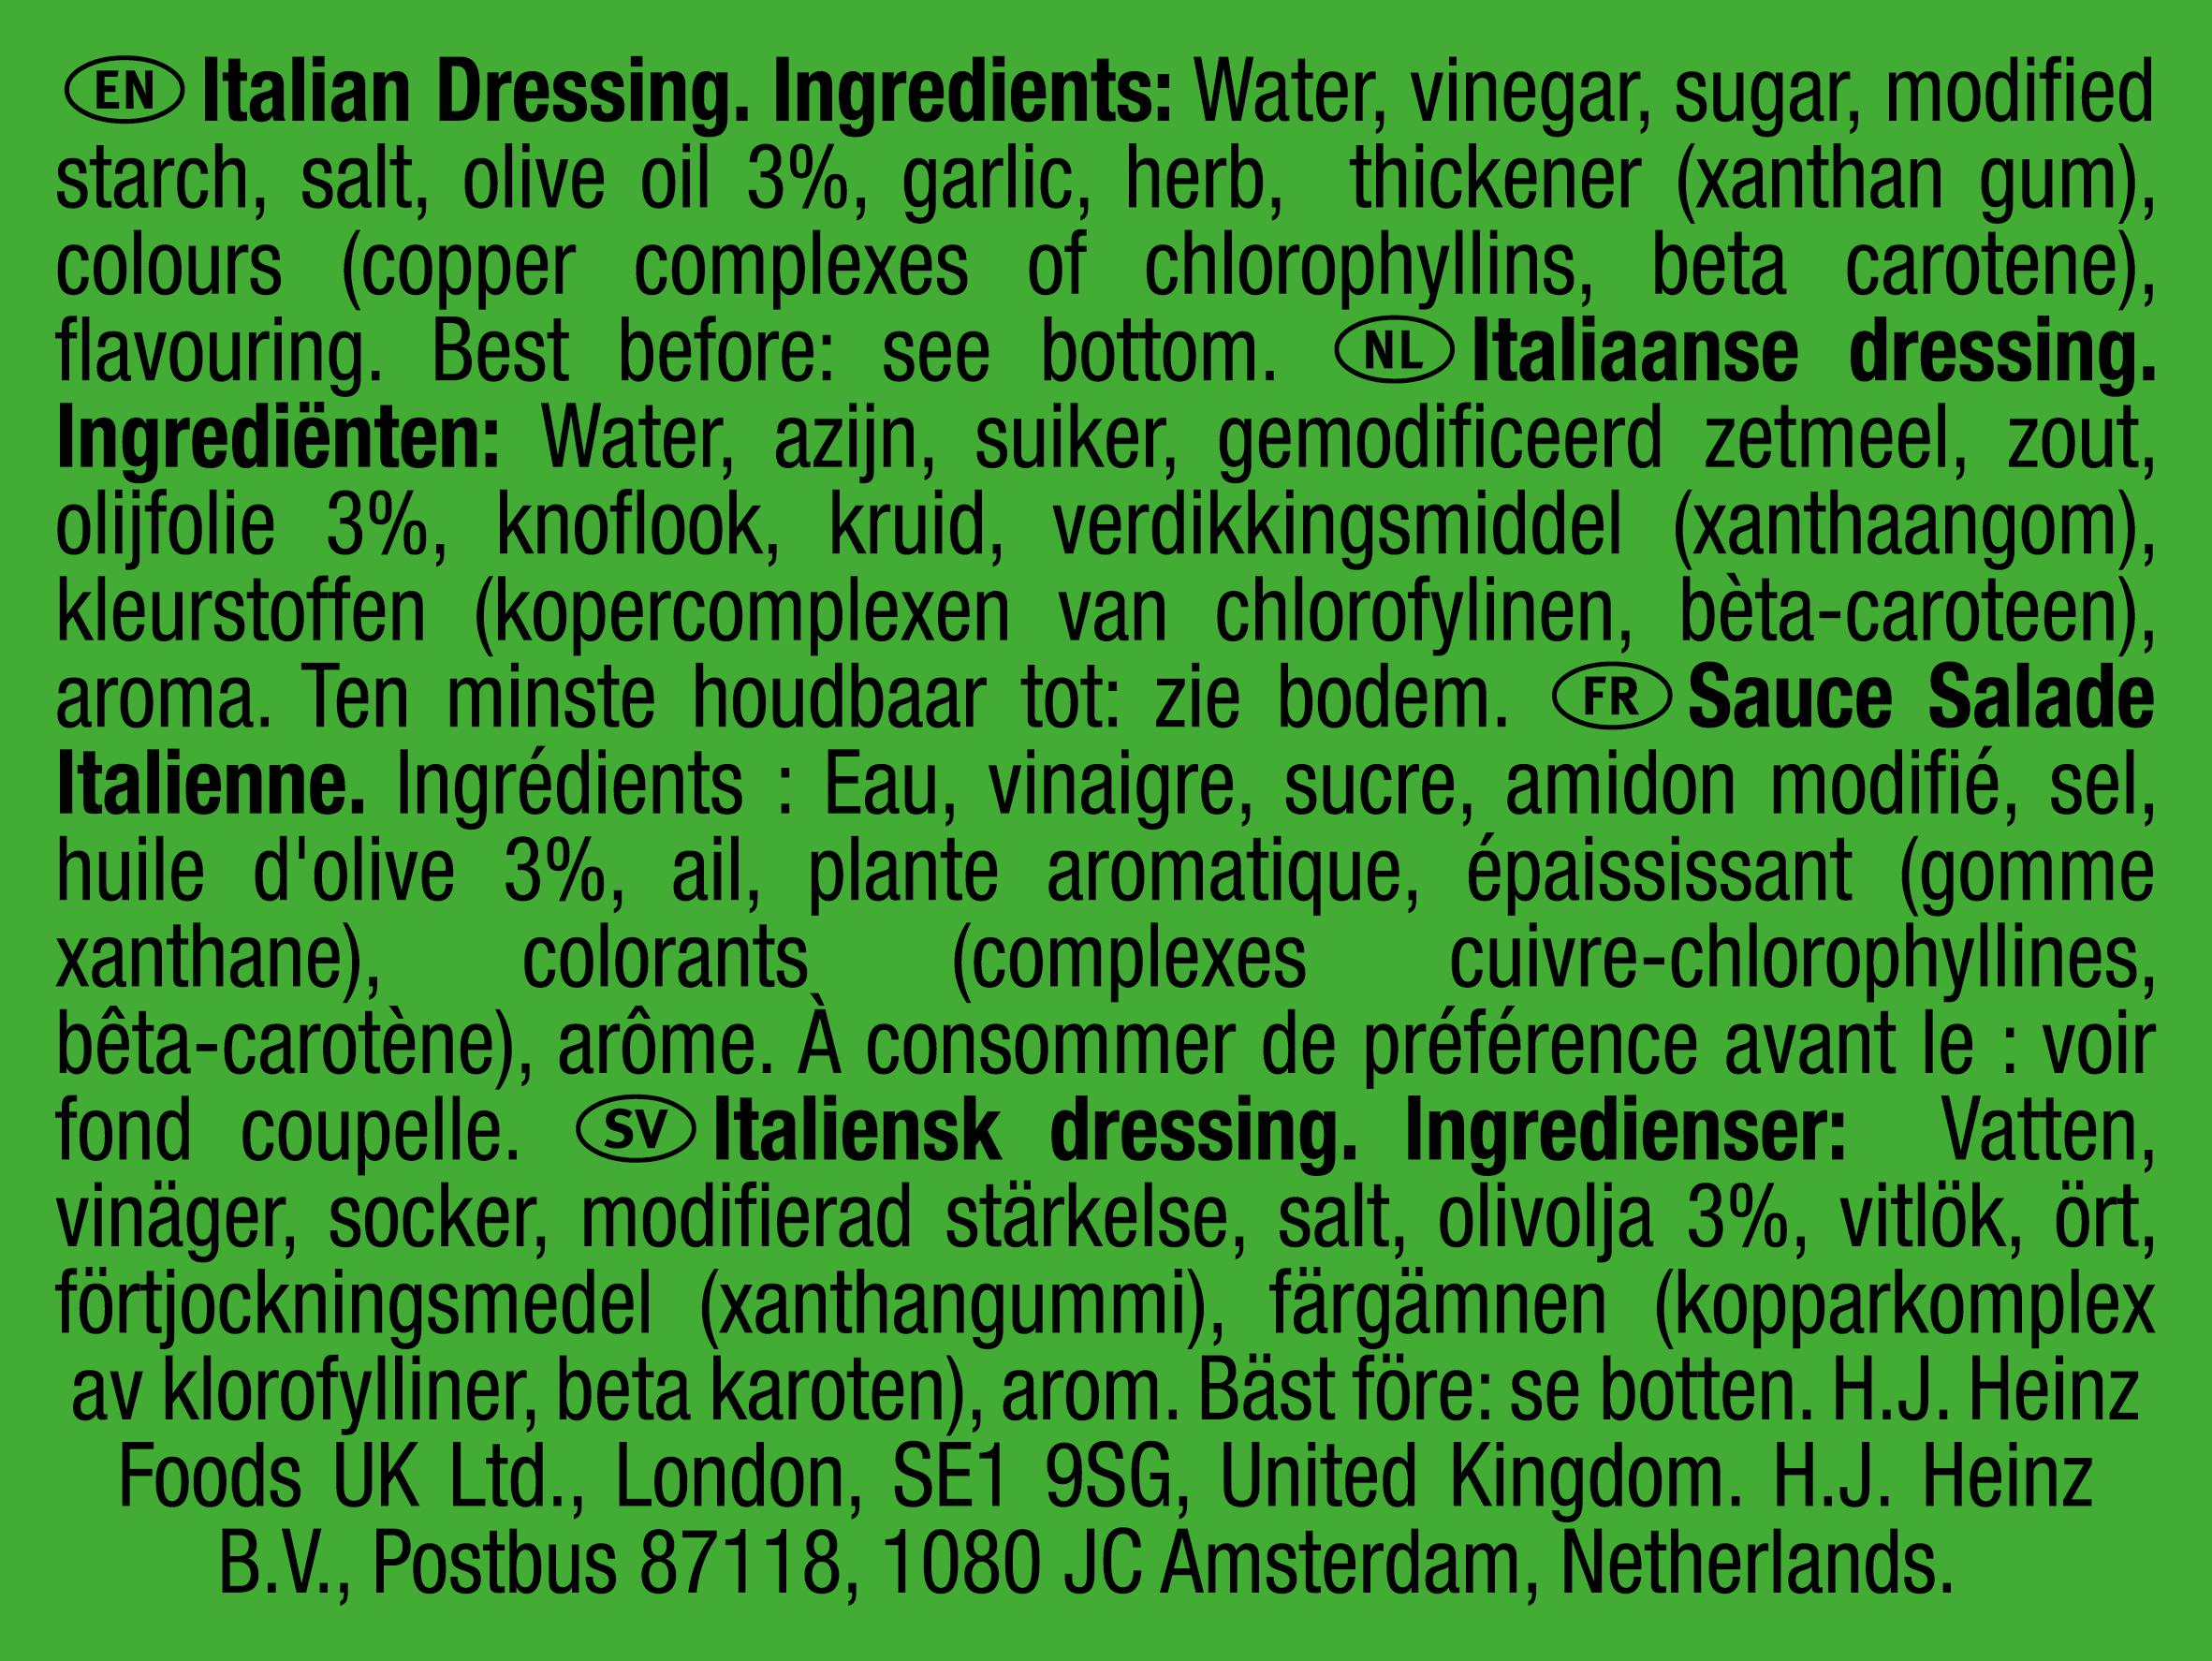 Heinz Italian Dressing 25ml dippot